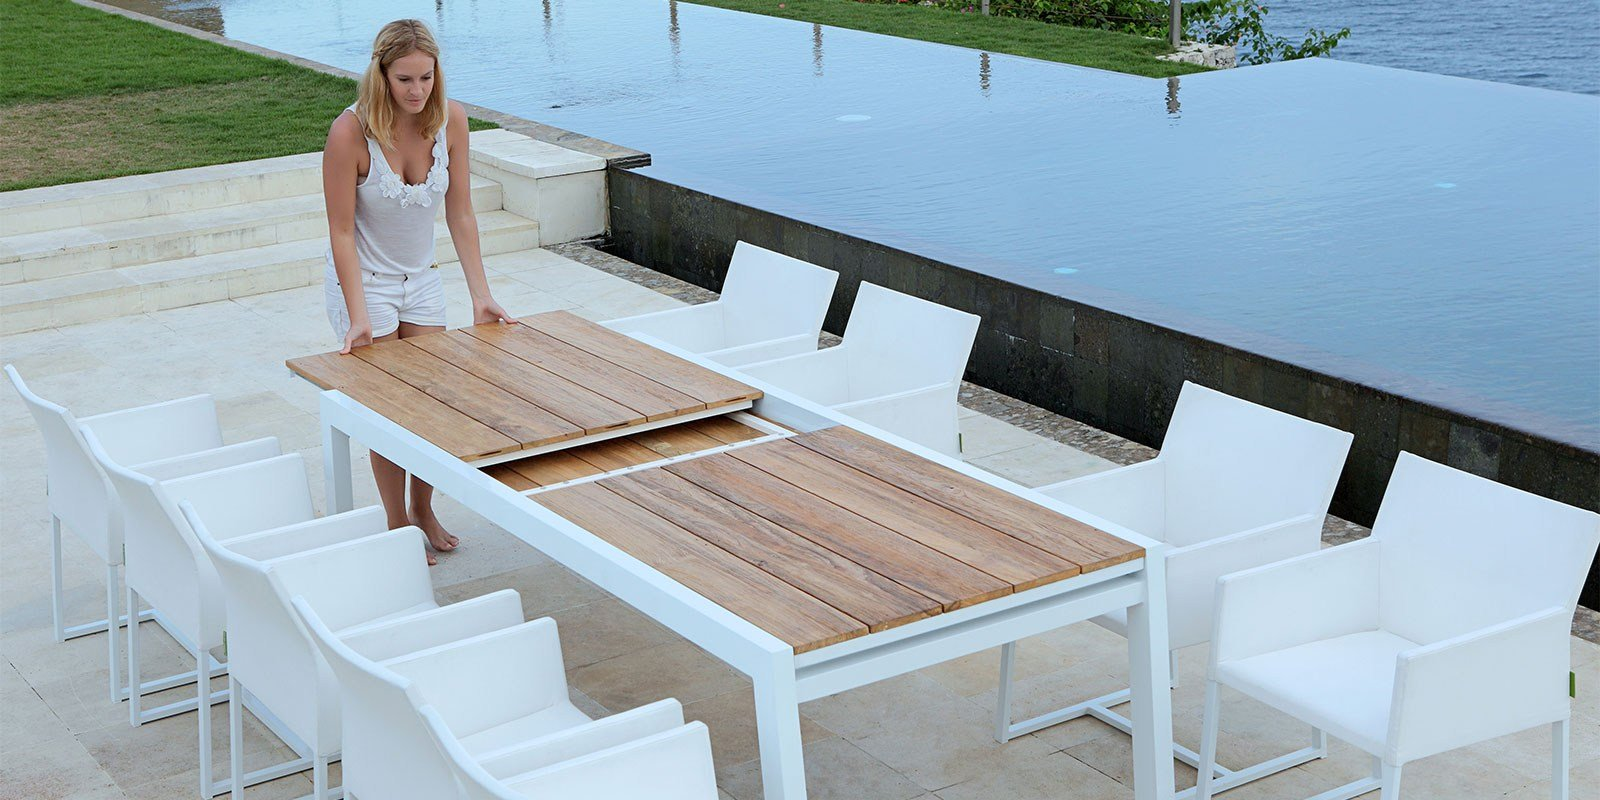 Tavoli estensibili in legno bergen bergen tavolo for Tavoli estensibili in legno